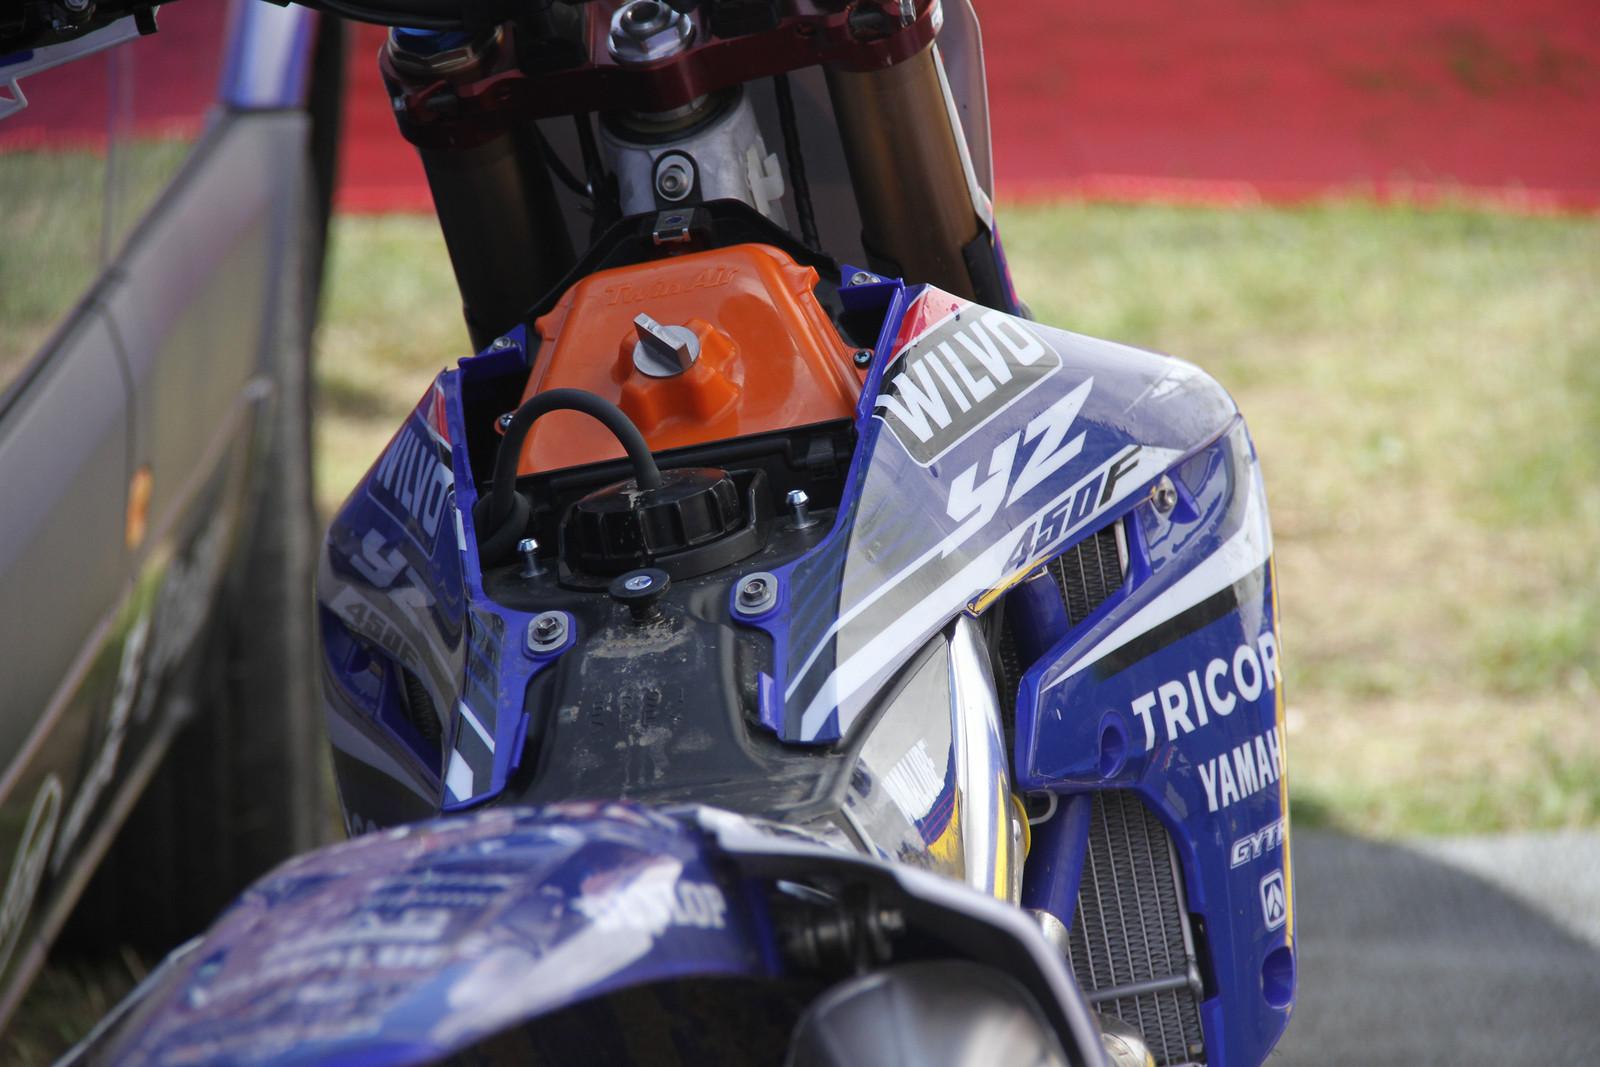 Arnaud Tonus 2018 Yamaha YZ450F - ayearinmx - Motocross Pictures - Vital MX